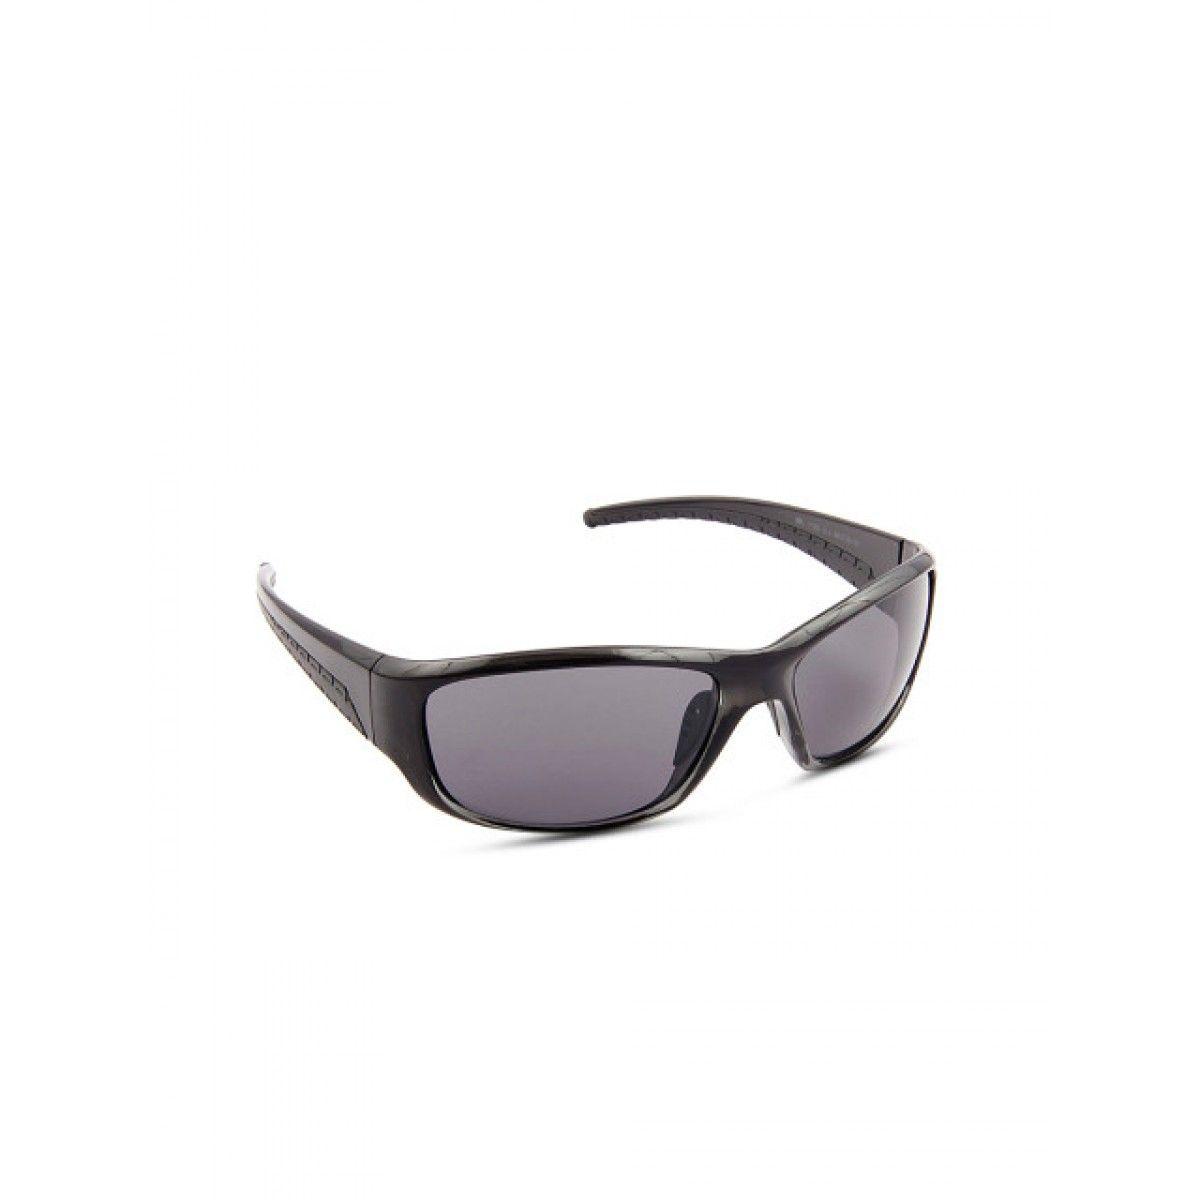 53afed7dd2b9 Buy Farenheit Unisex Rectangular Sports  Sunglasses SOC-FA-1183-C1 online  at  EclipseExpress